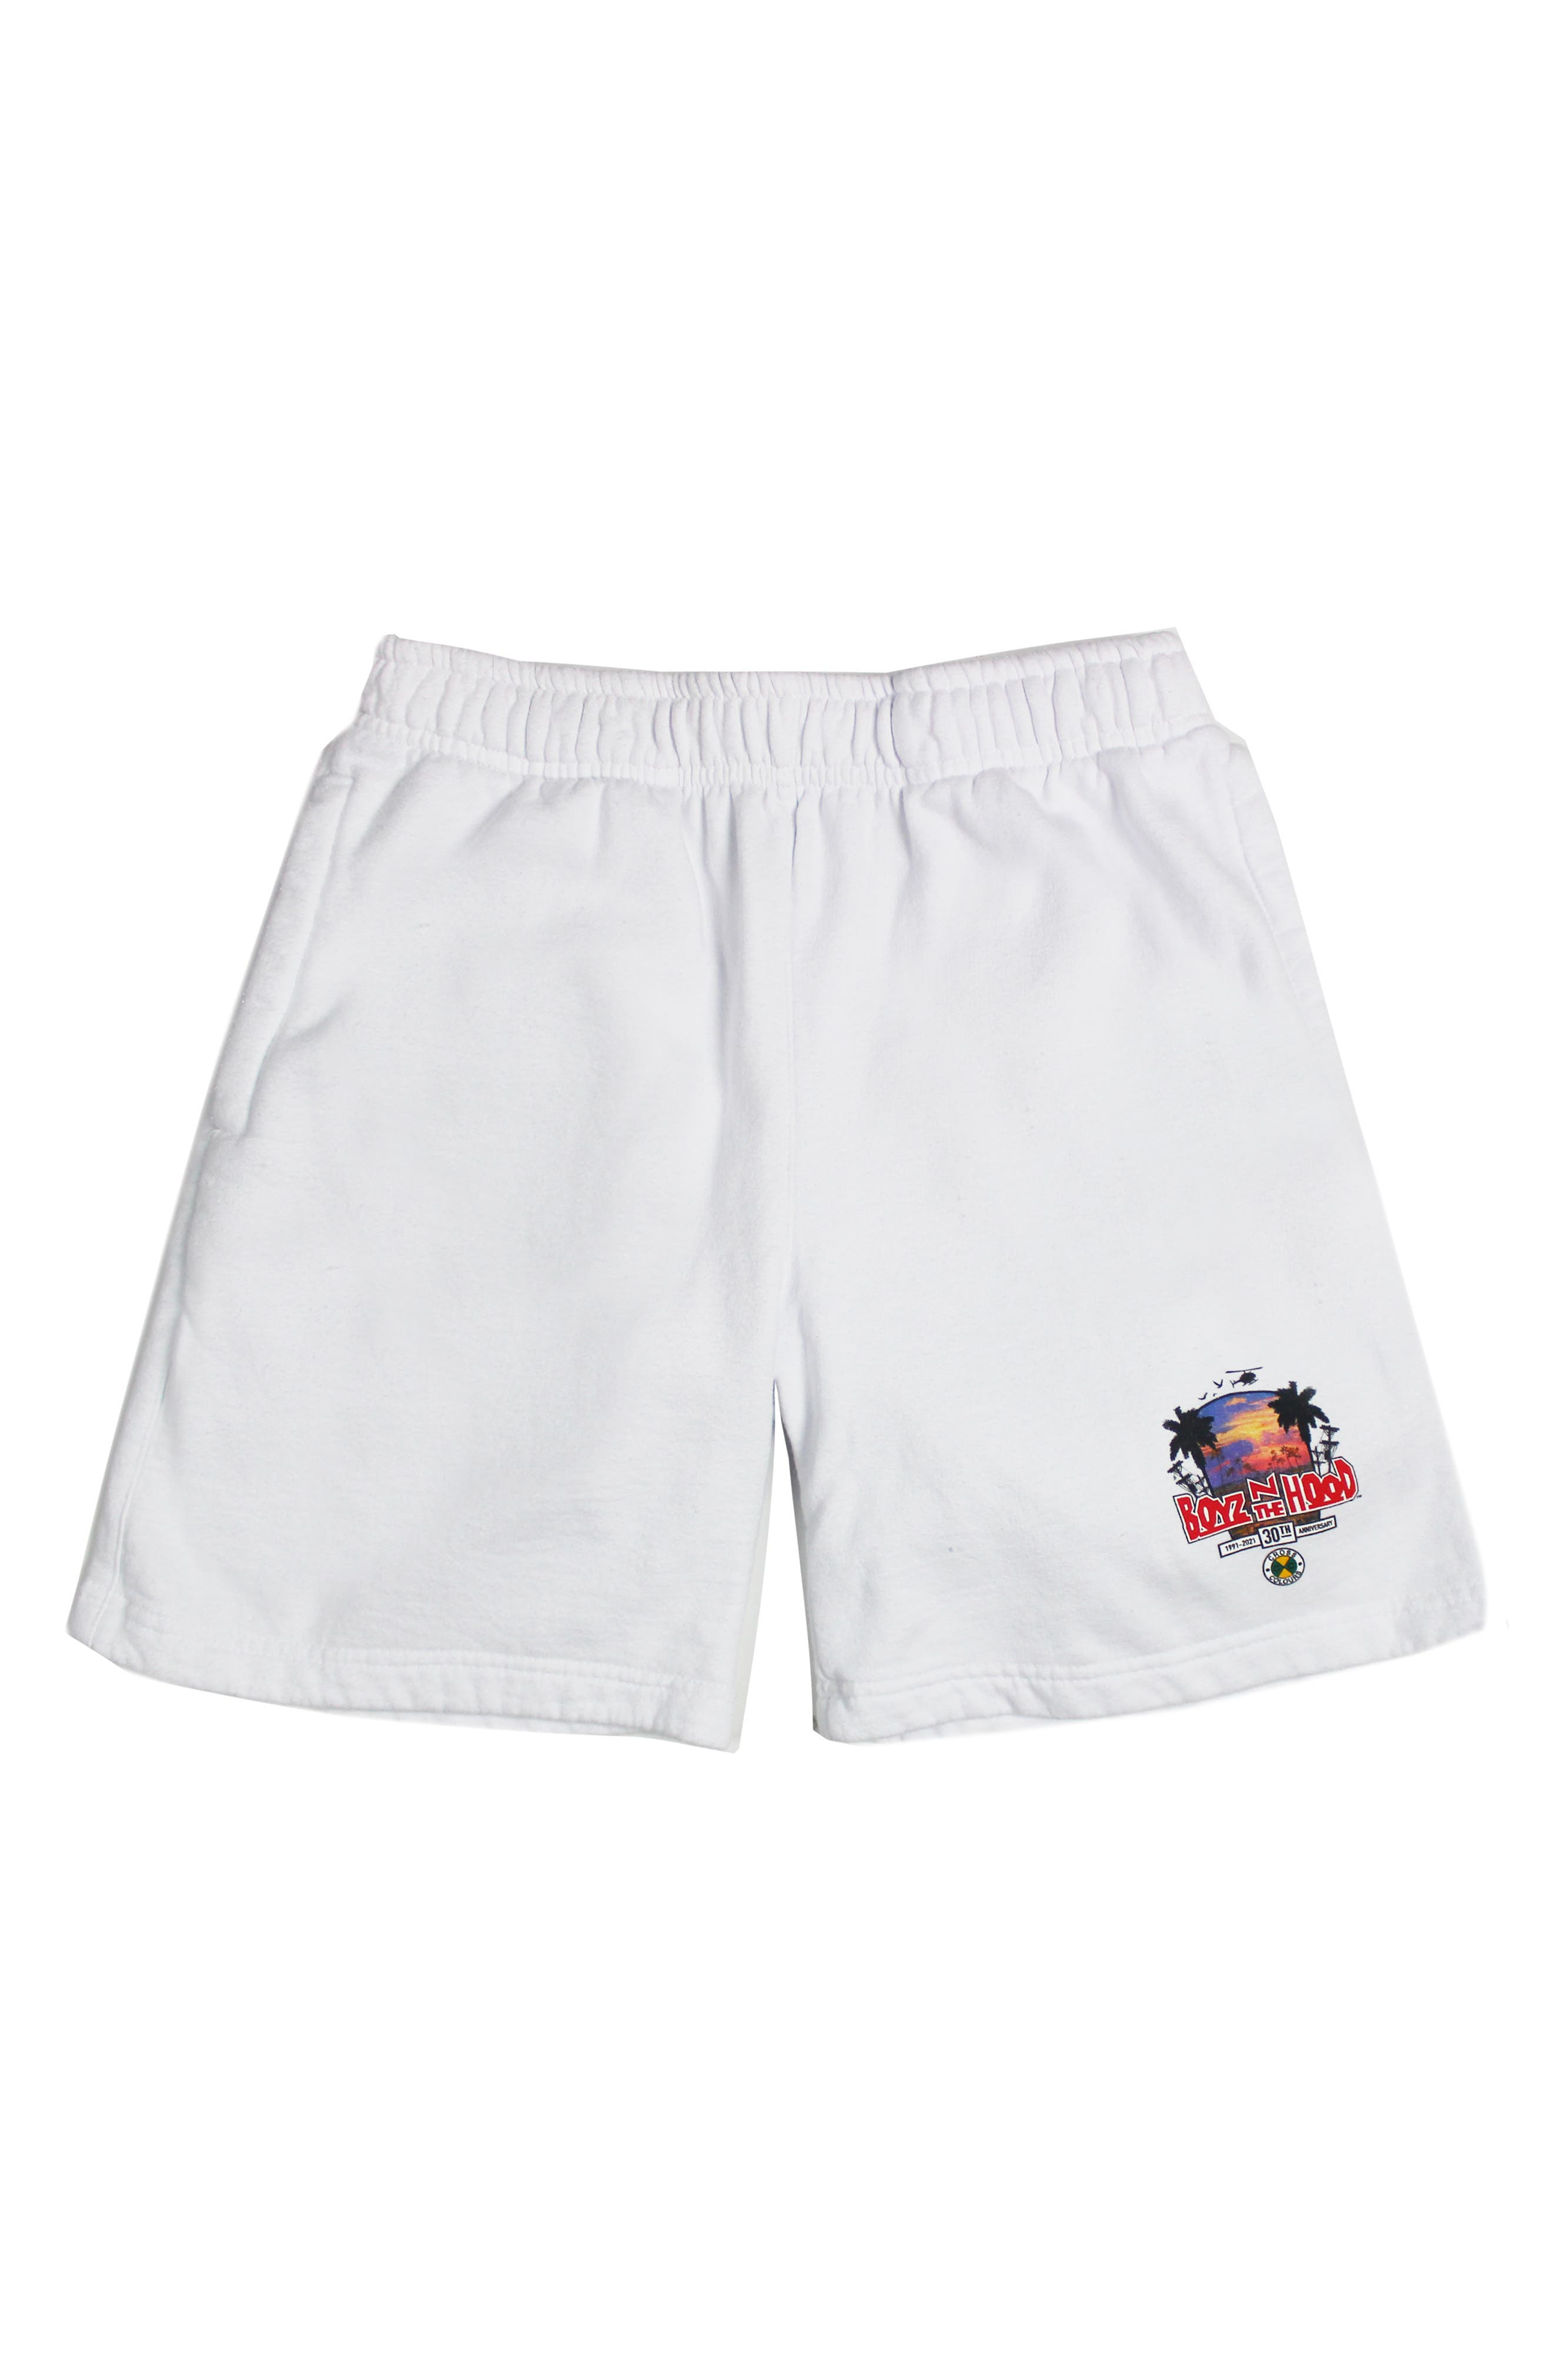 Boyz N The Hood Palm Street Shorts